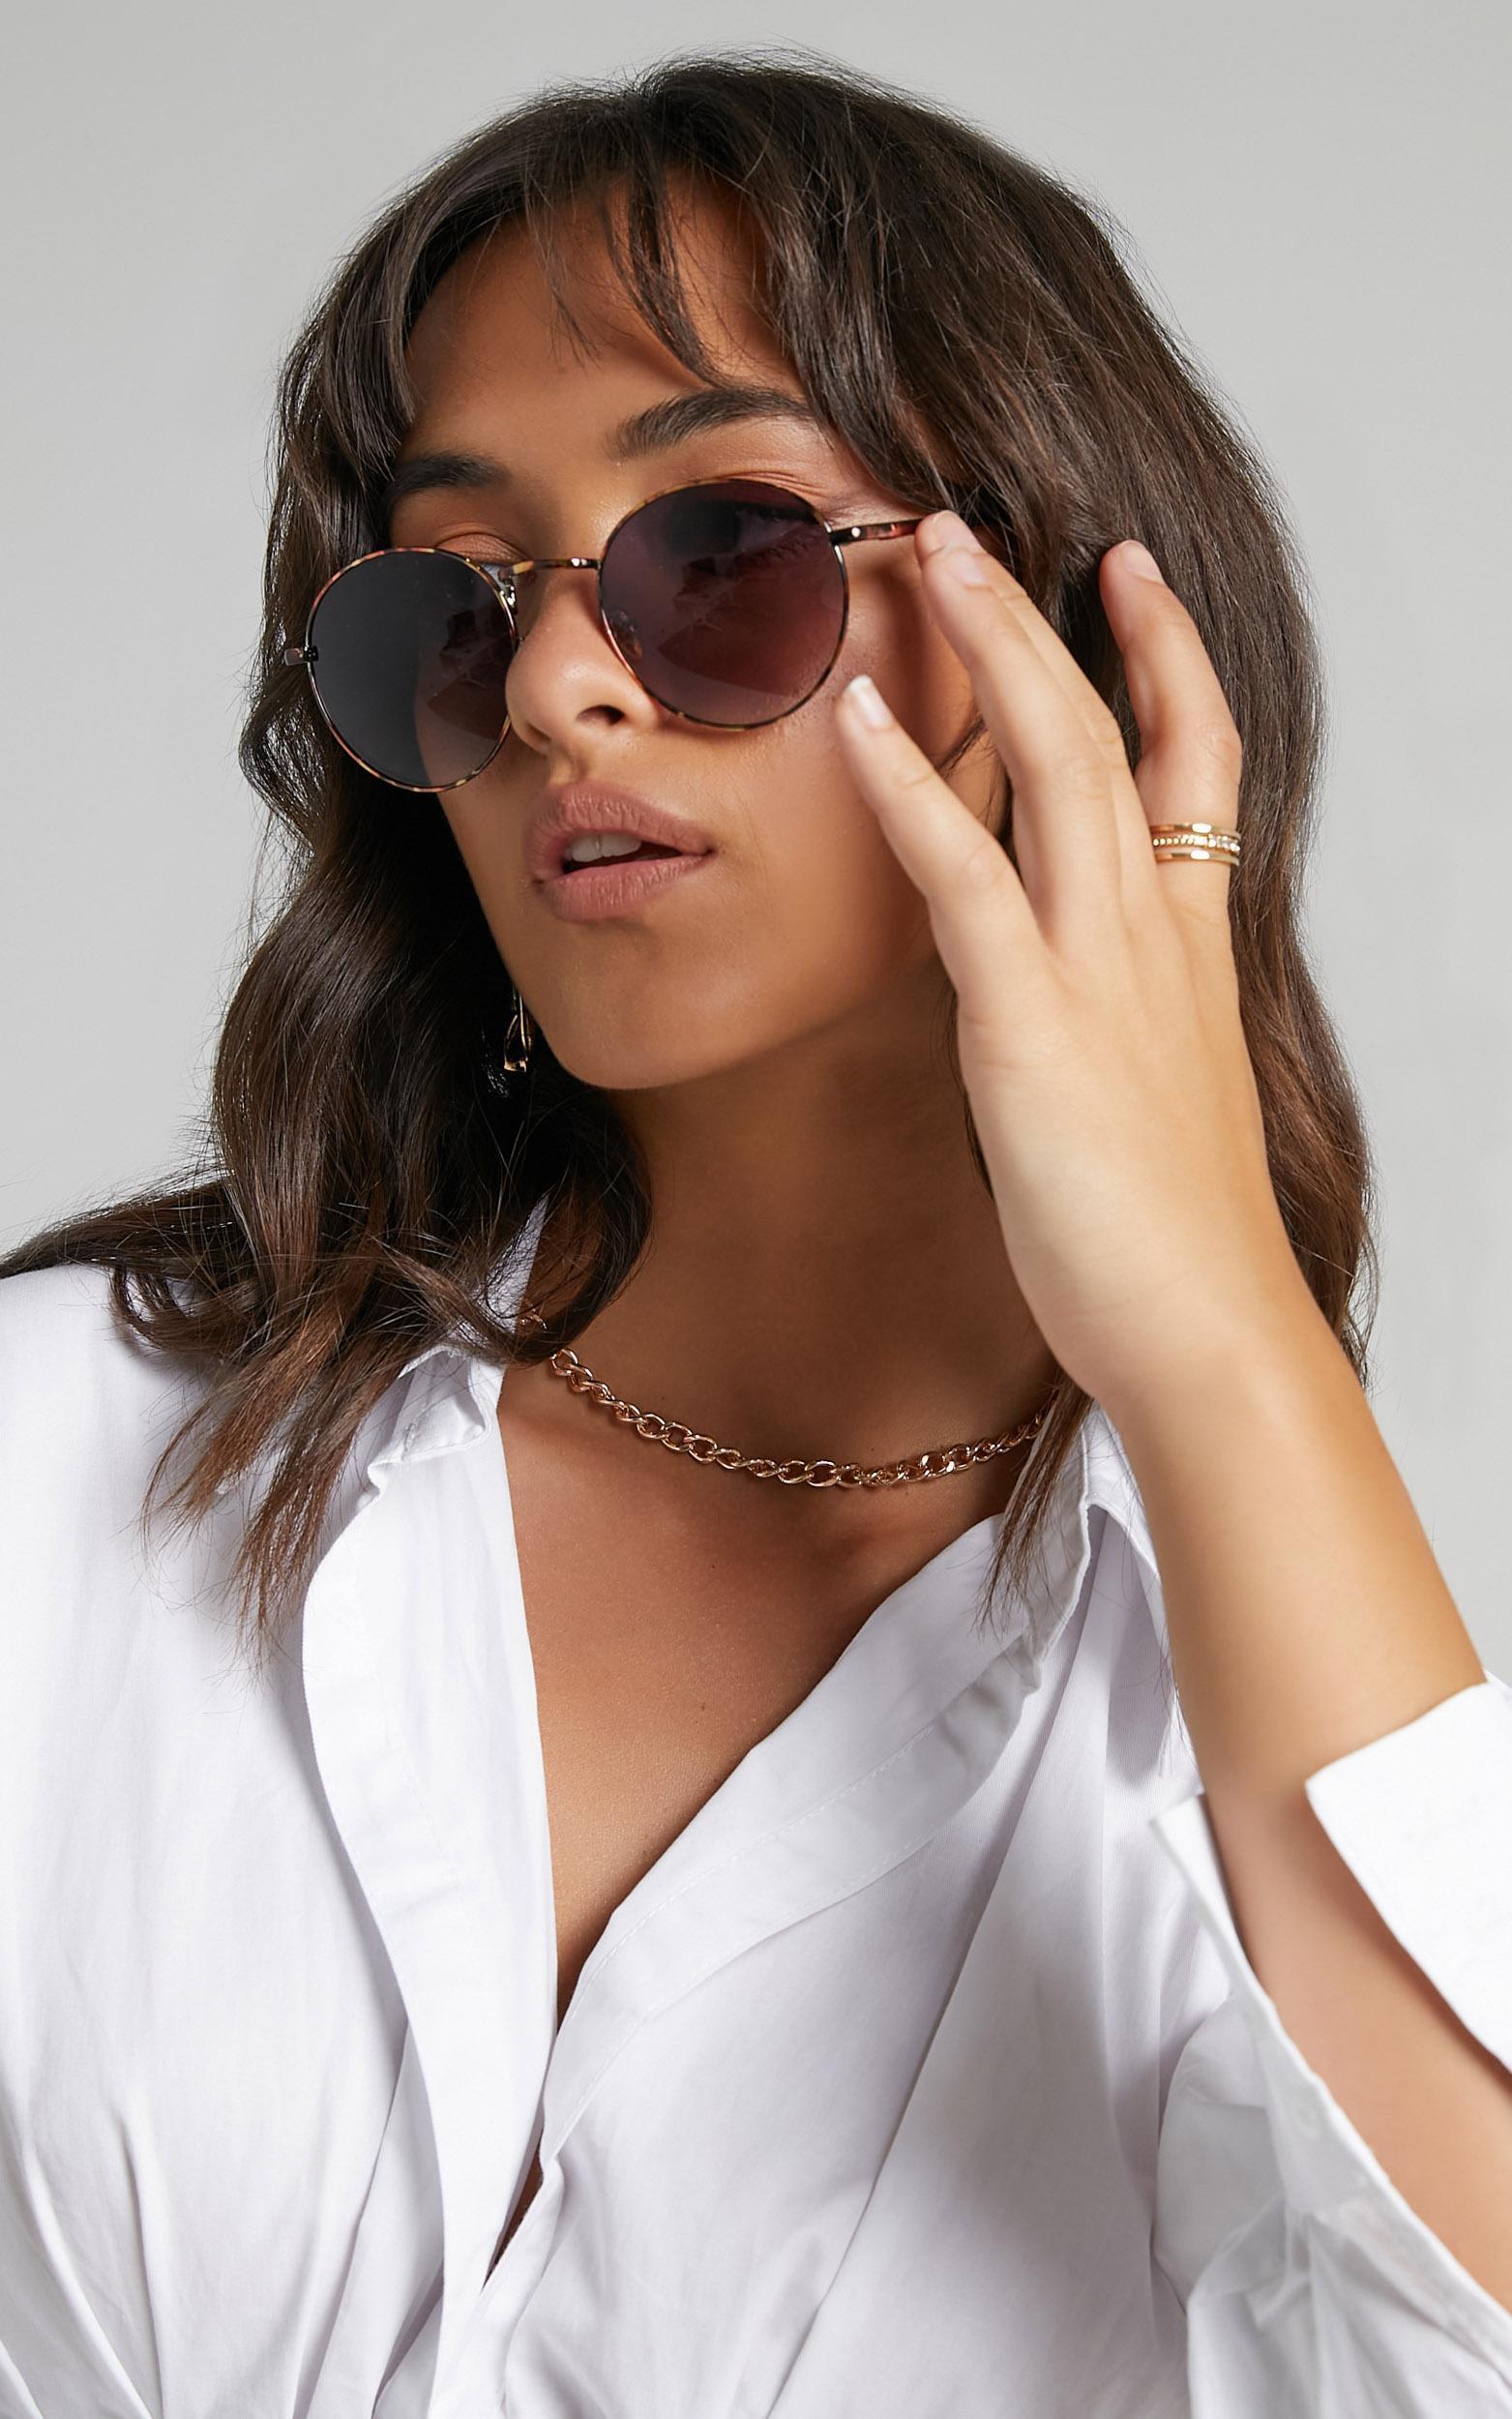 Reality Eyewear - Instant Karma Sunglasses in Turtle, , hi-res image number null